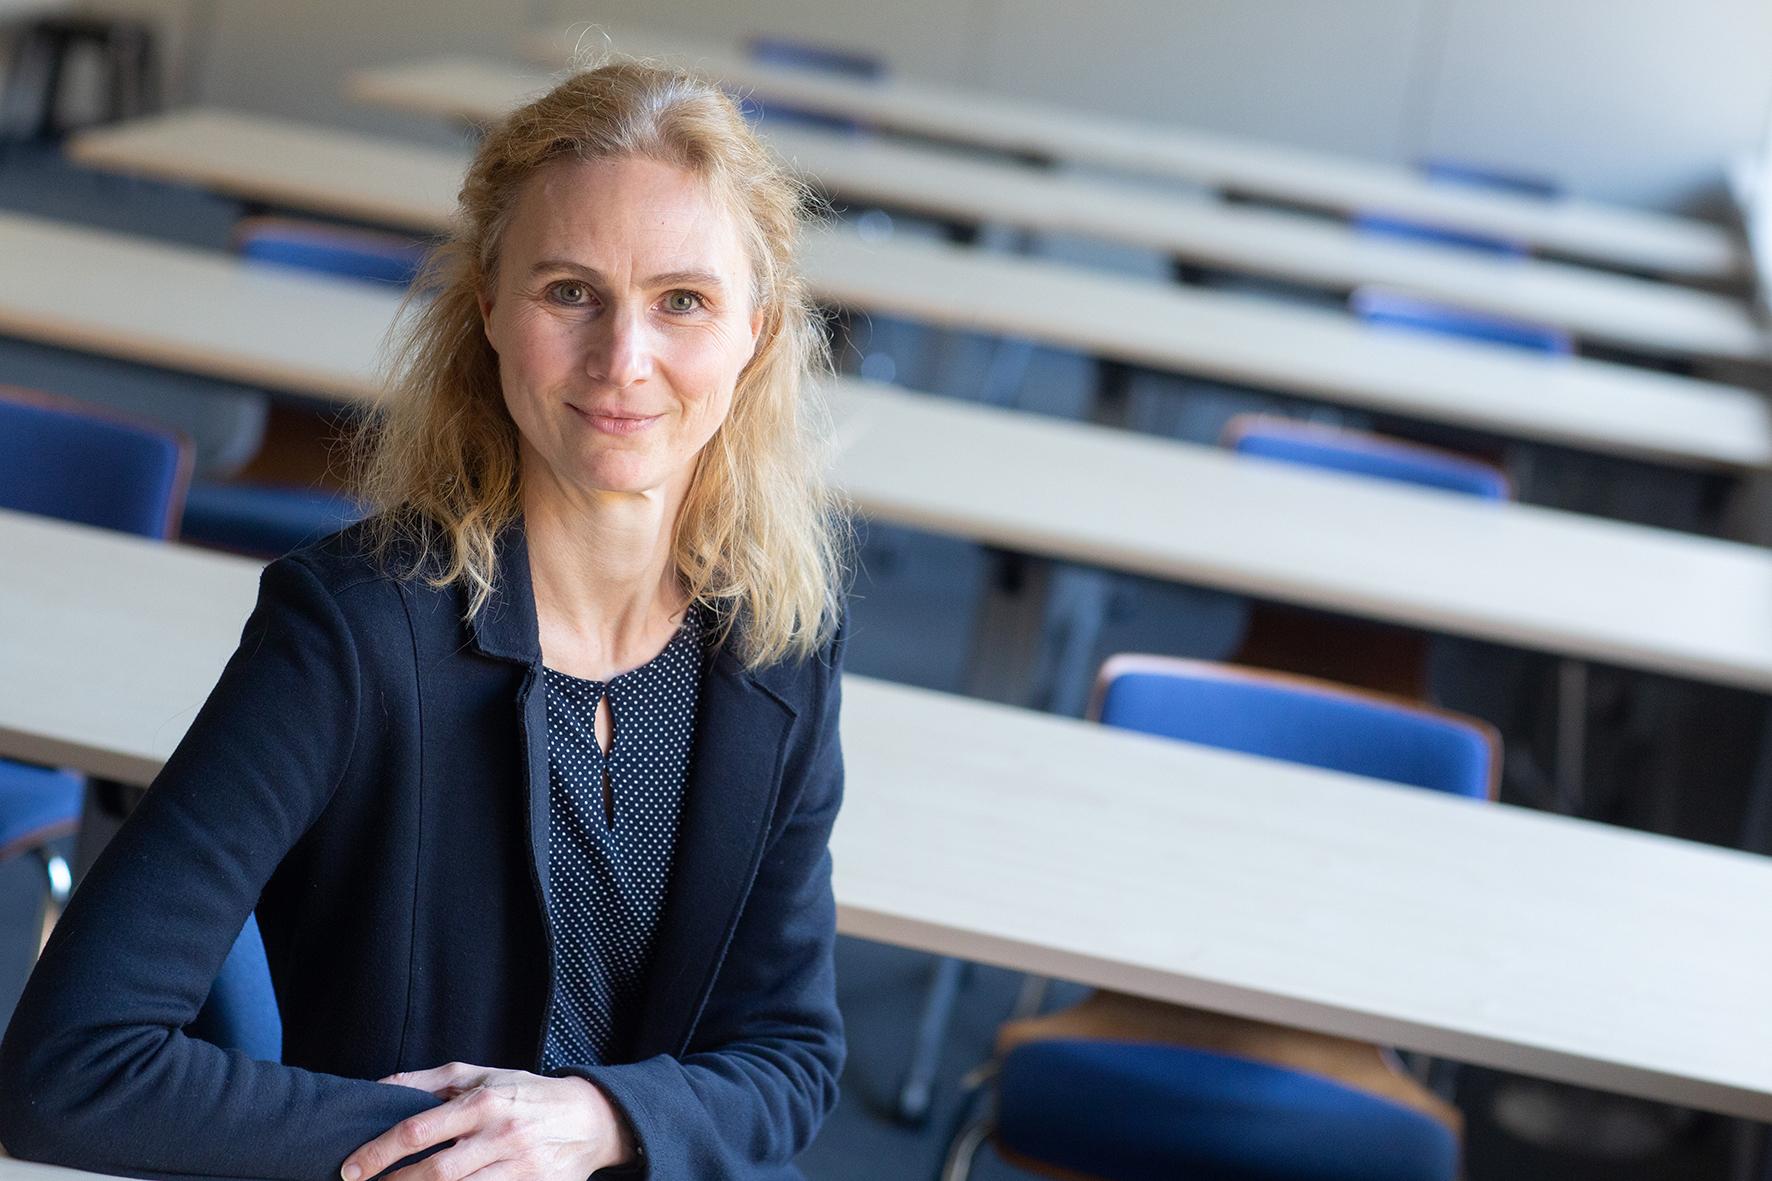 Prof. Dr. Birgit Möller-Kallista